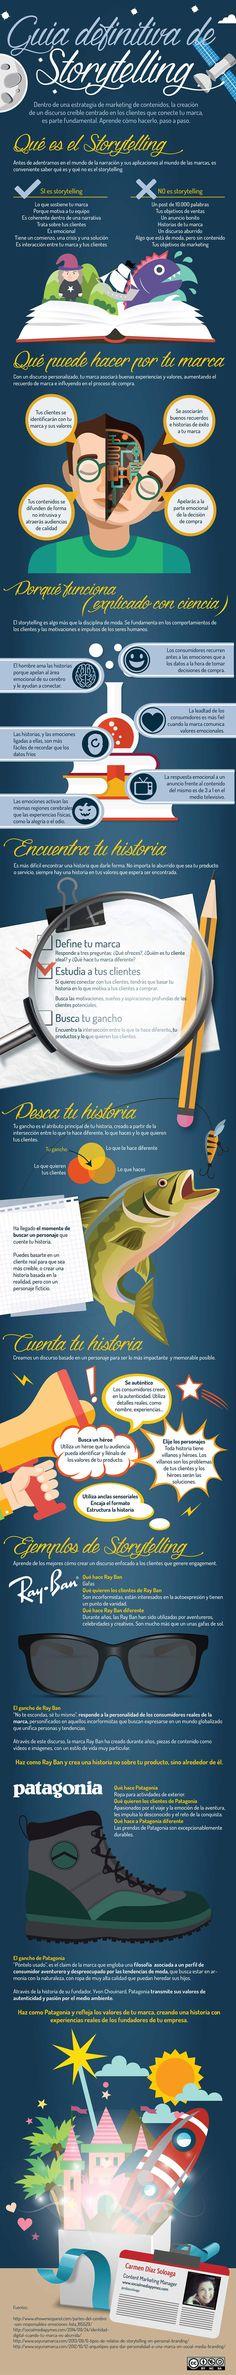 Guía definitiva de Storytelling. Infografía en español. #CommunityManager